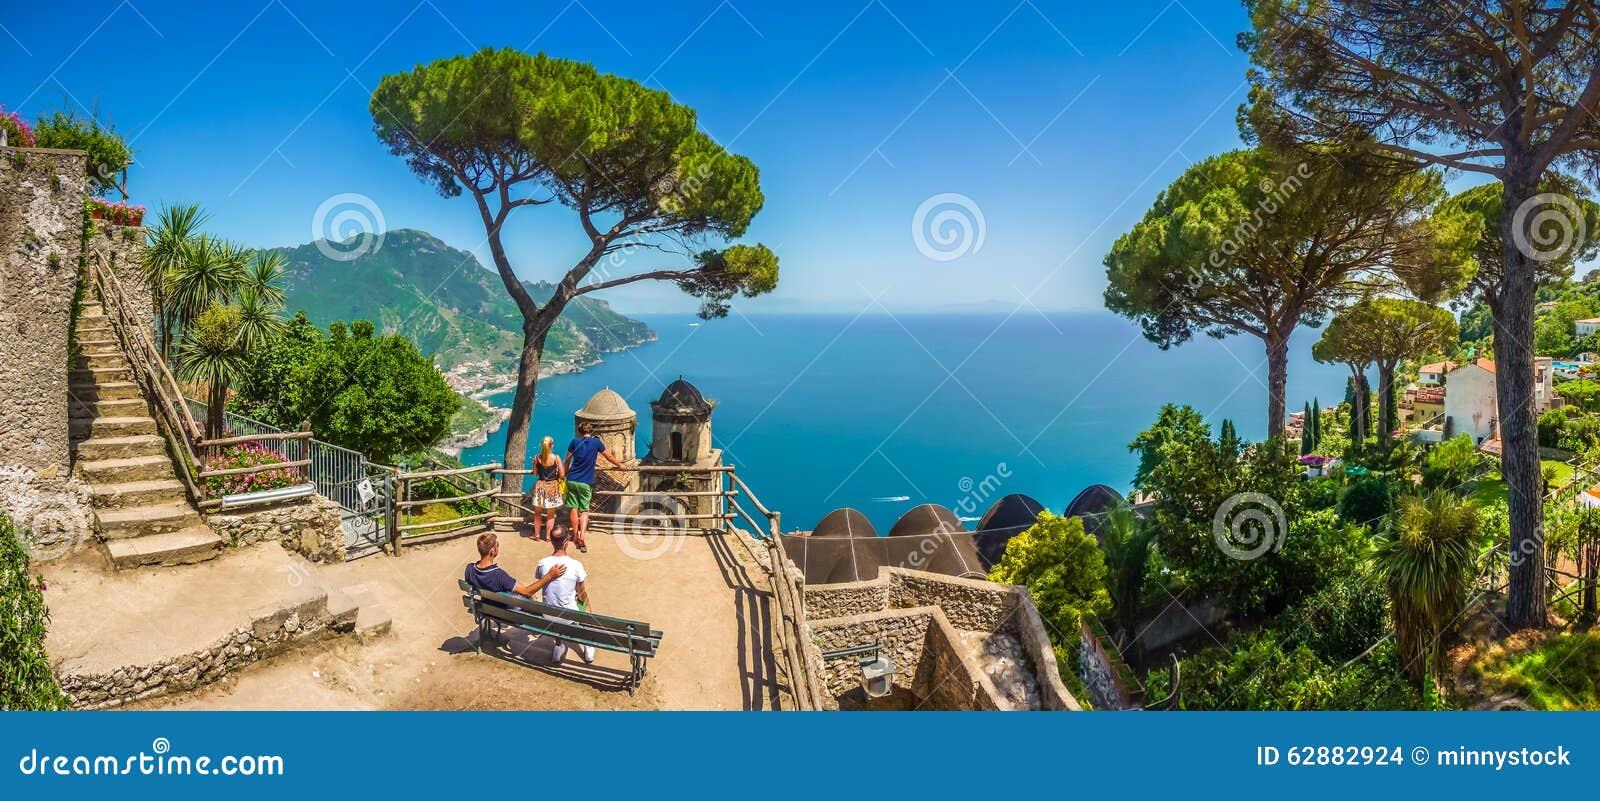 La côte d Amalfi de la villa Rufolo fait du jardinage dans Ravello, Campanie, Italie